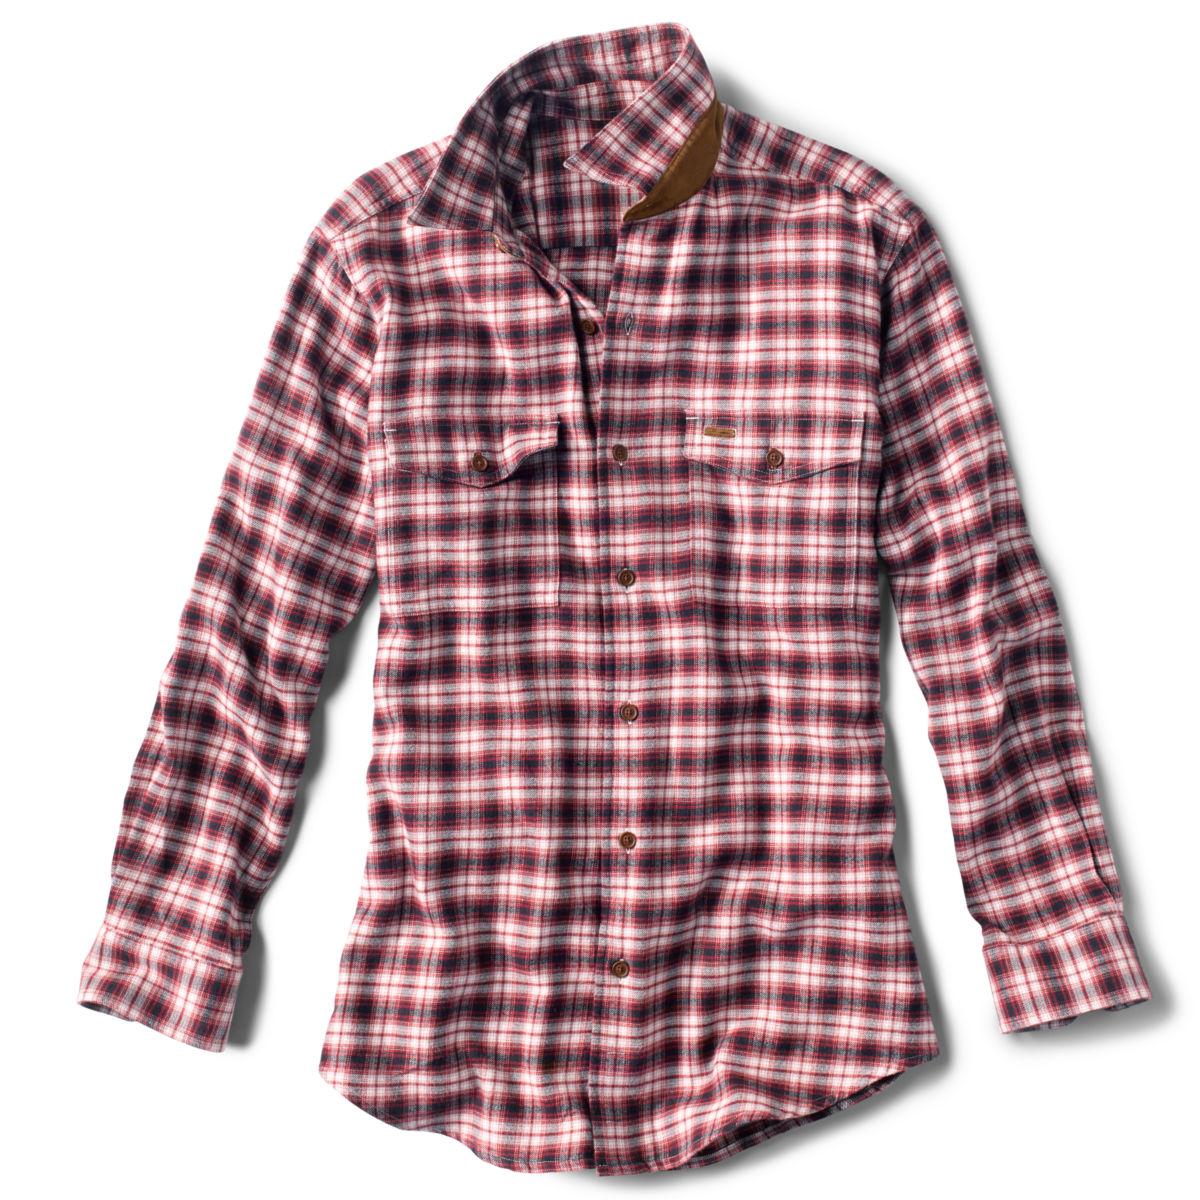 Fairbanks Ombré Plaid Long-Sleeved Shirt - REDimage number 0